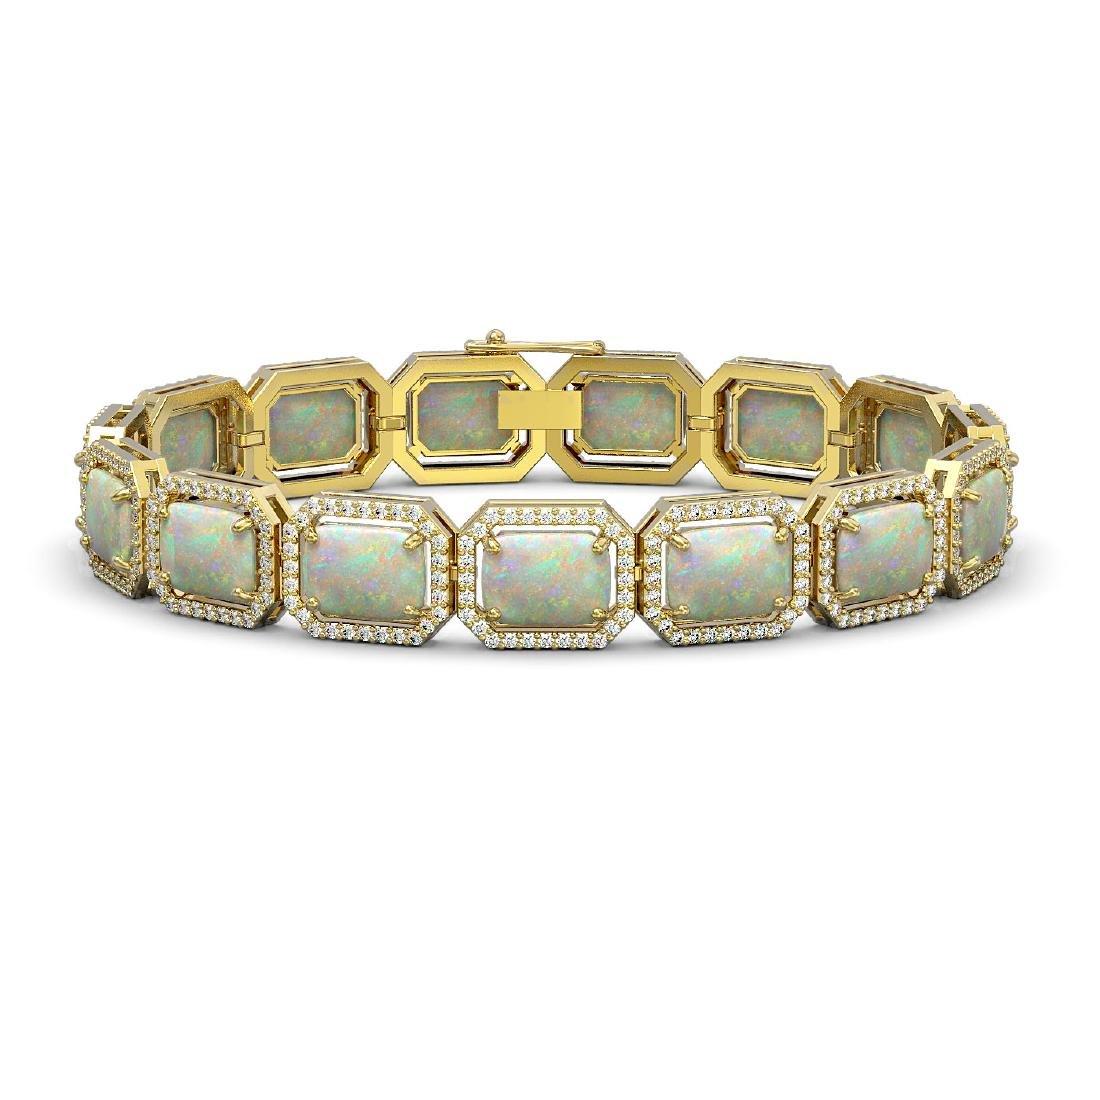 24.37 CTW Opal & Diamond Halo Bracelet 10K Yellow Gold